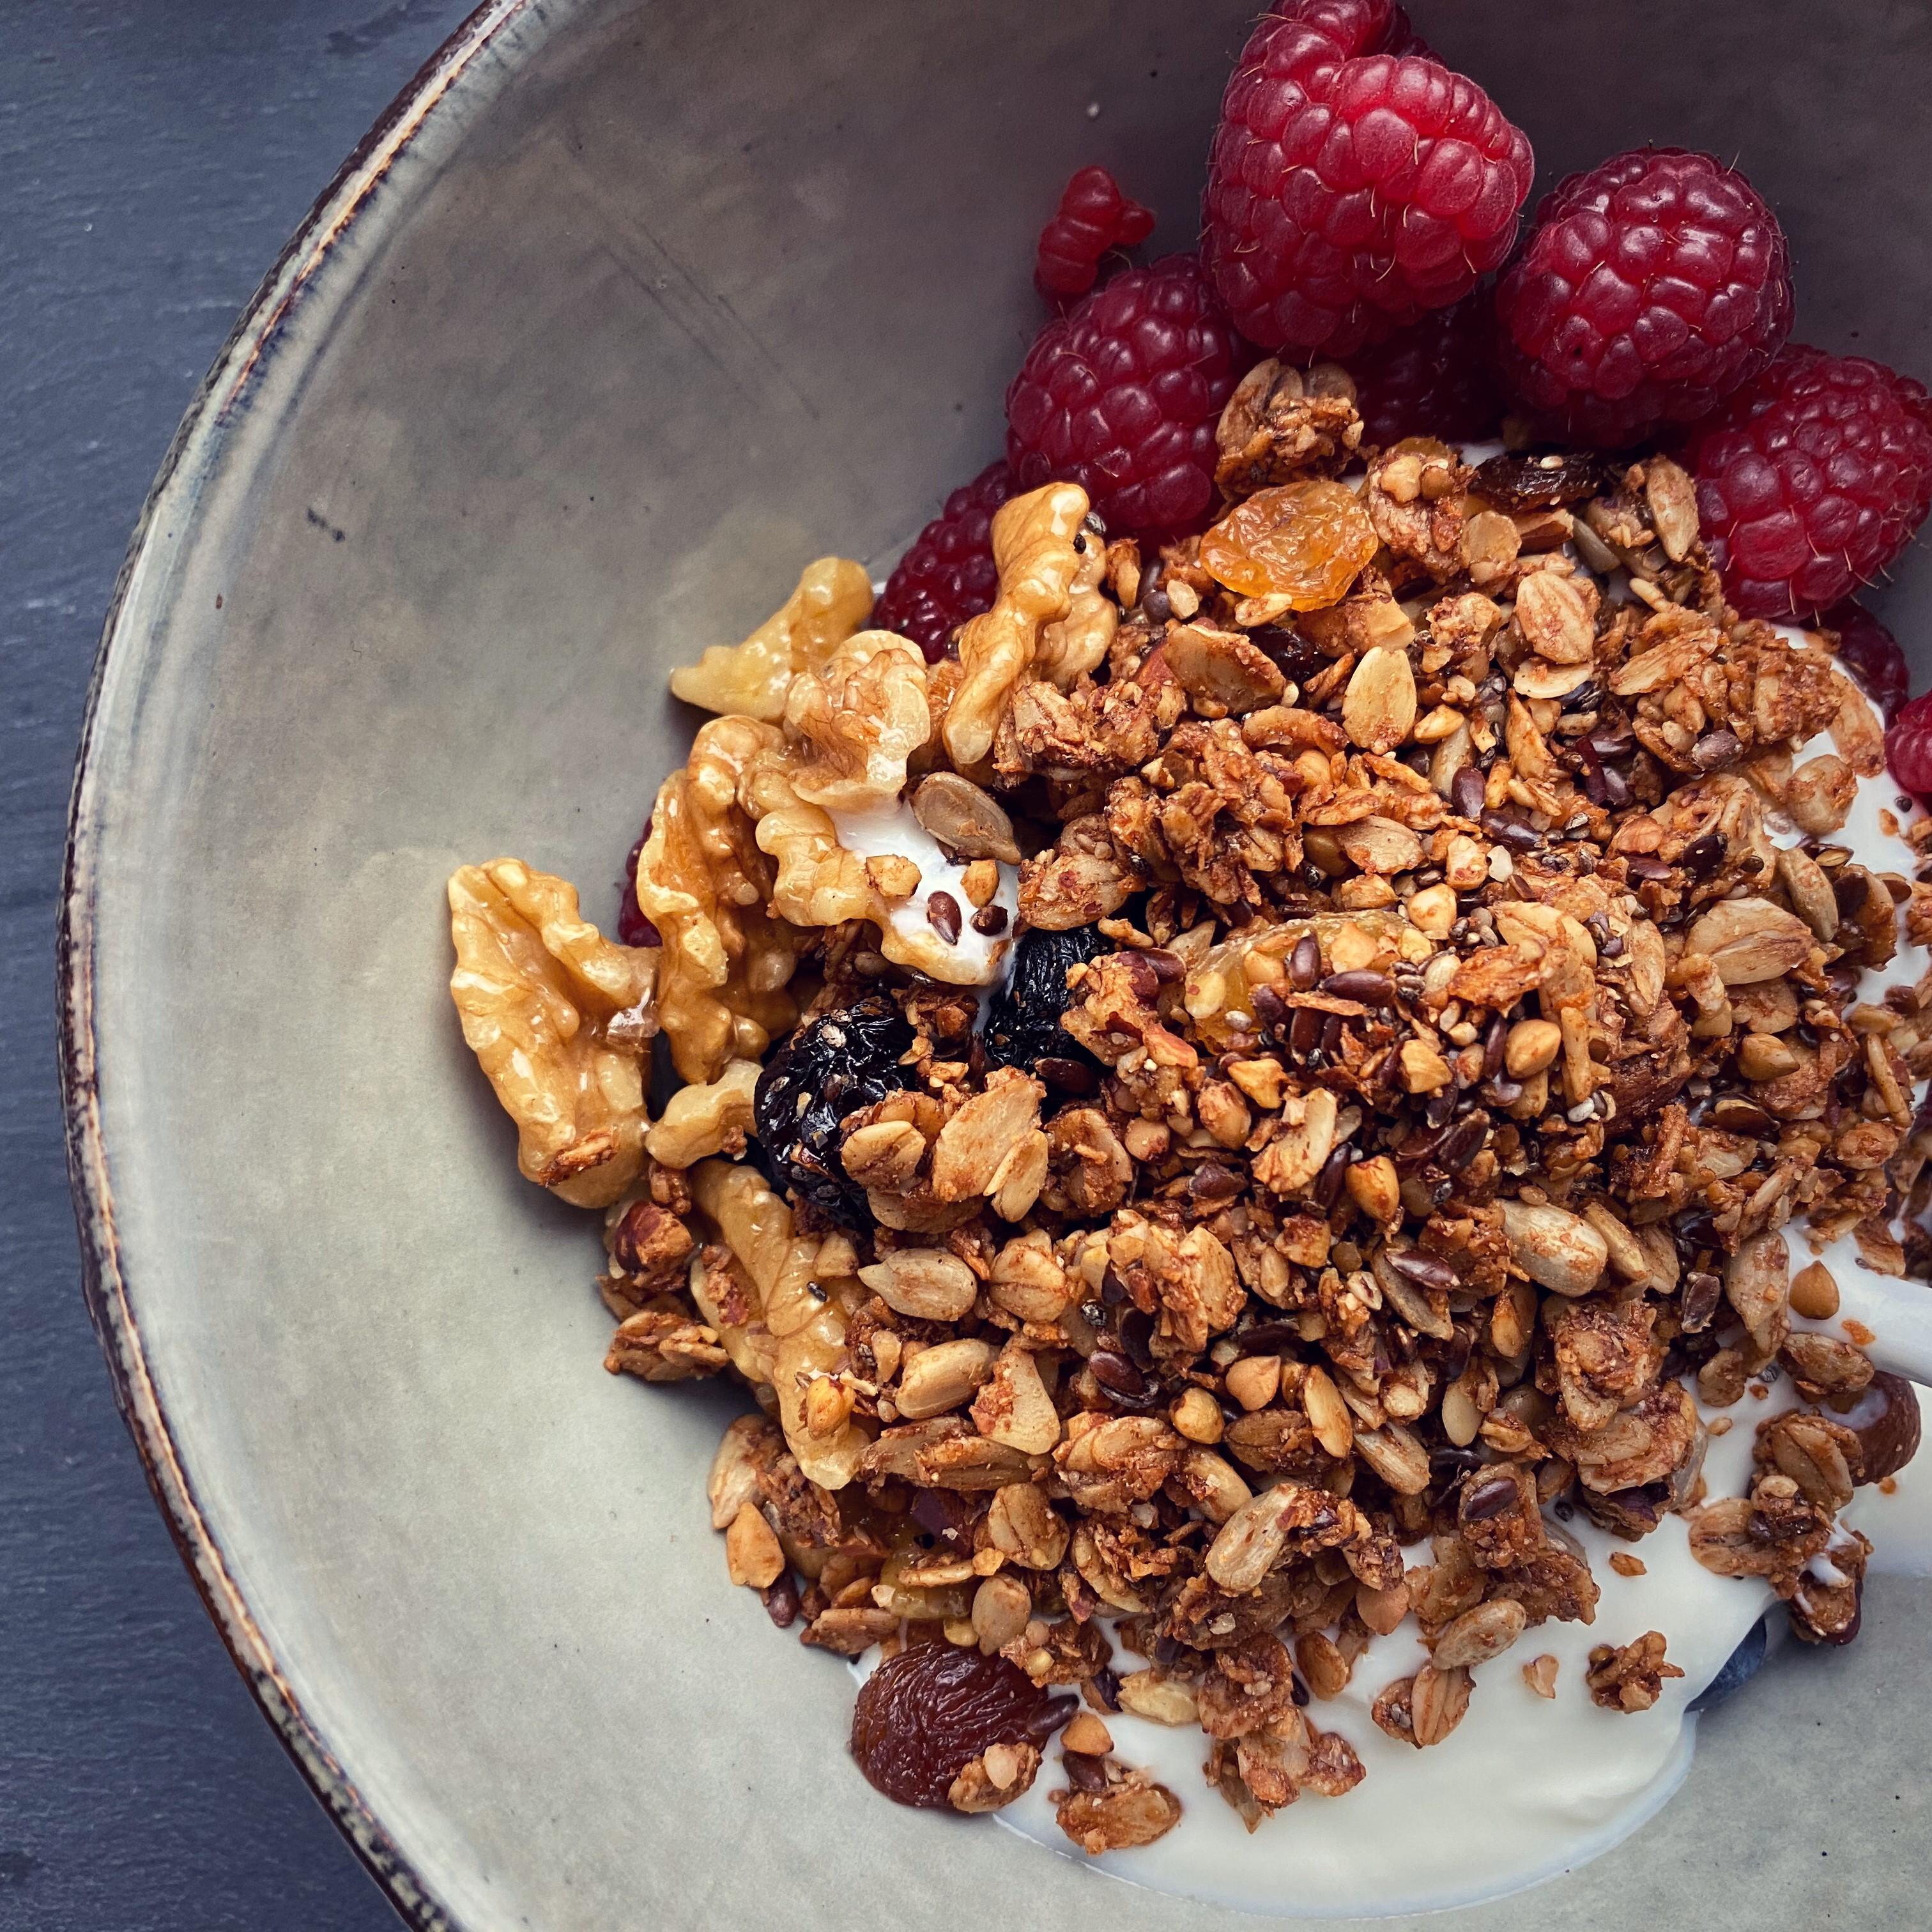 Greek Yogurt Bowls with Granola